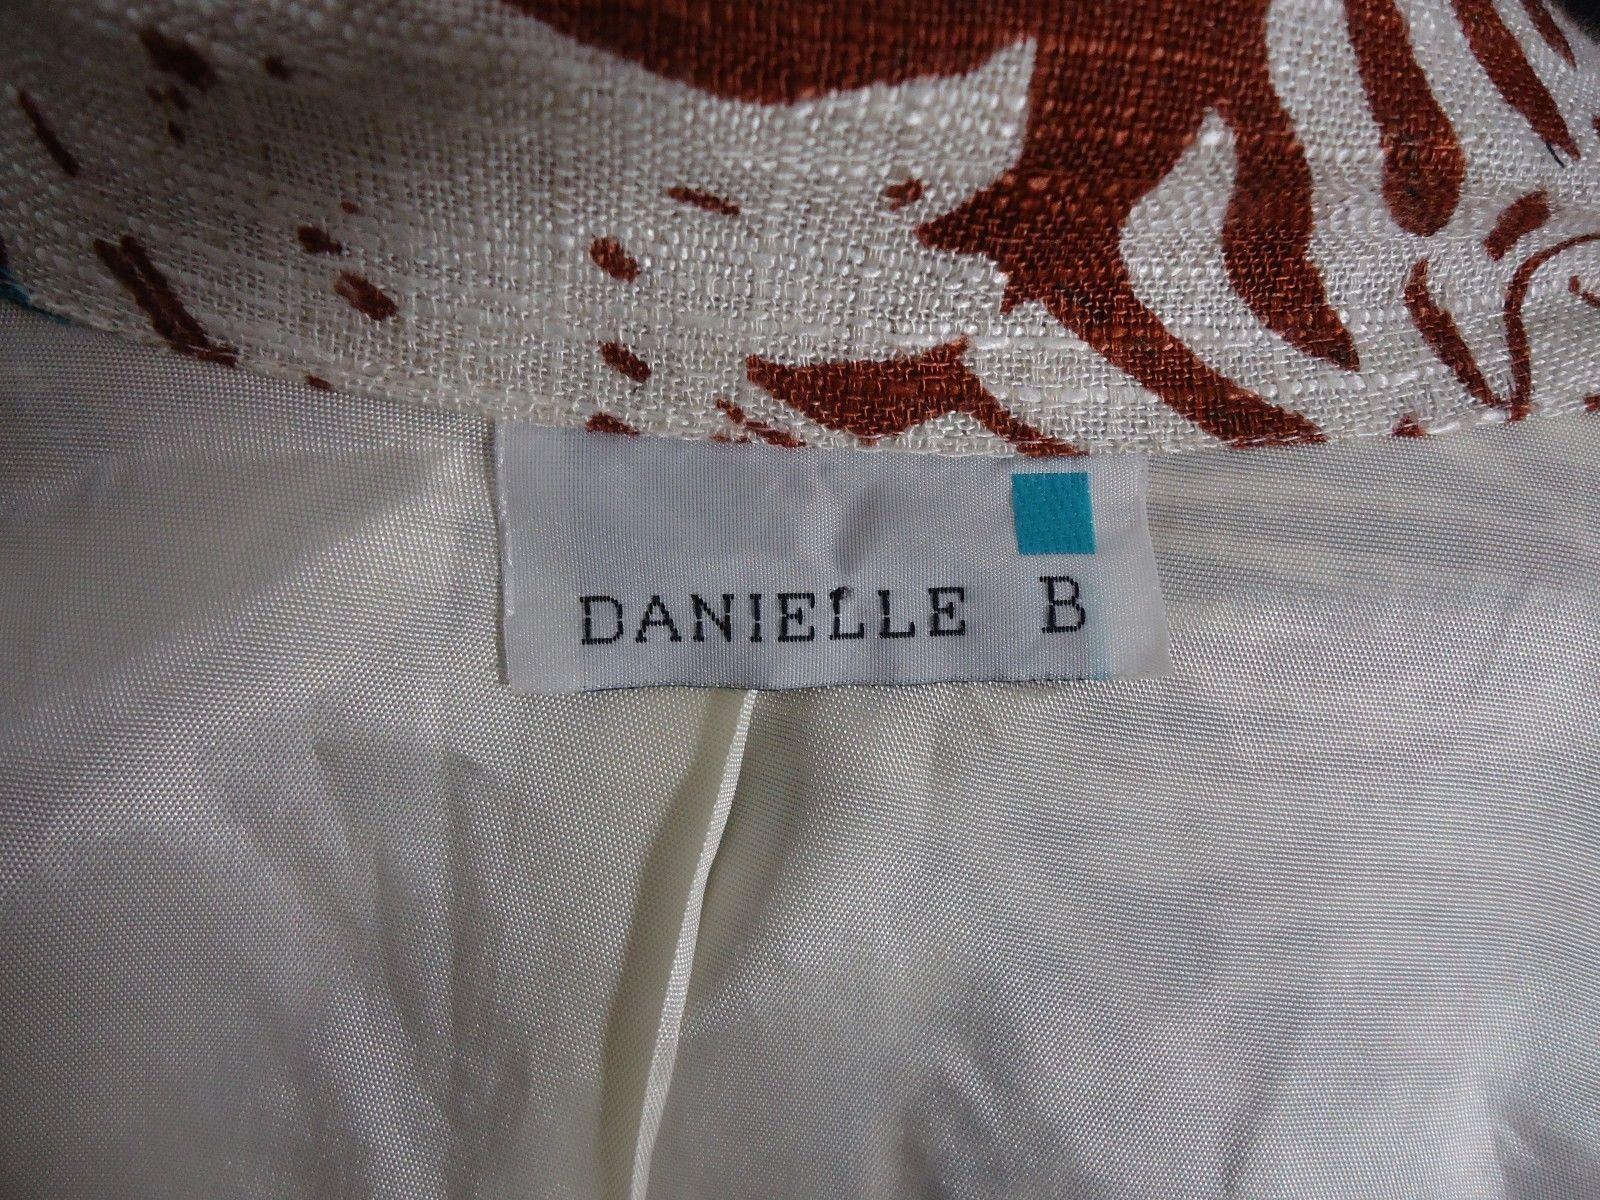 Danielle B Jacket Blazer Foliage, Leaves, Leaf, Floral, Work, Office, Casual